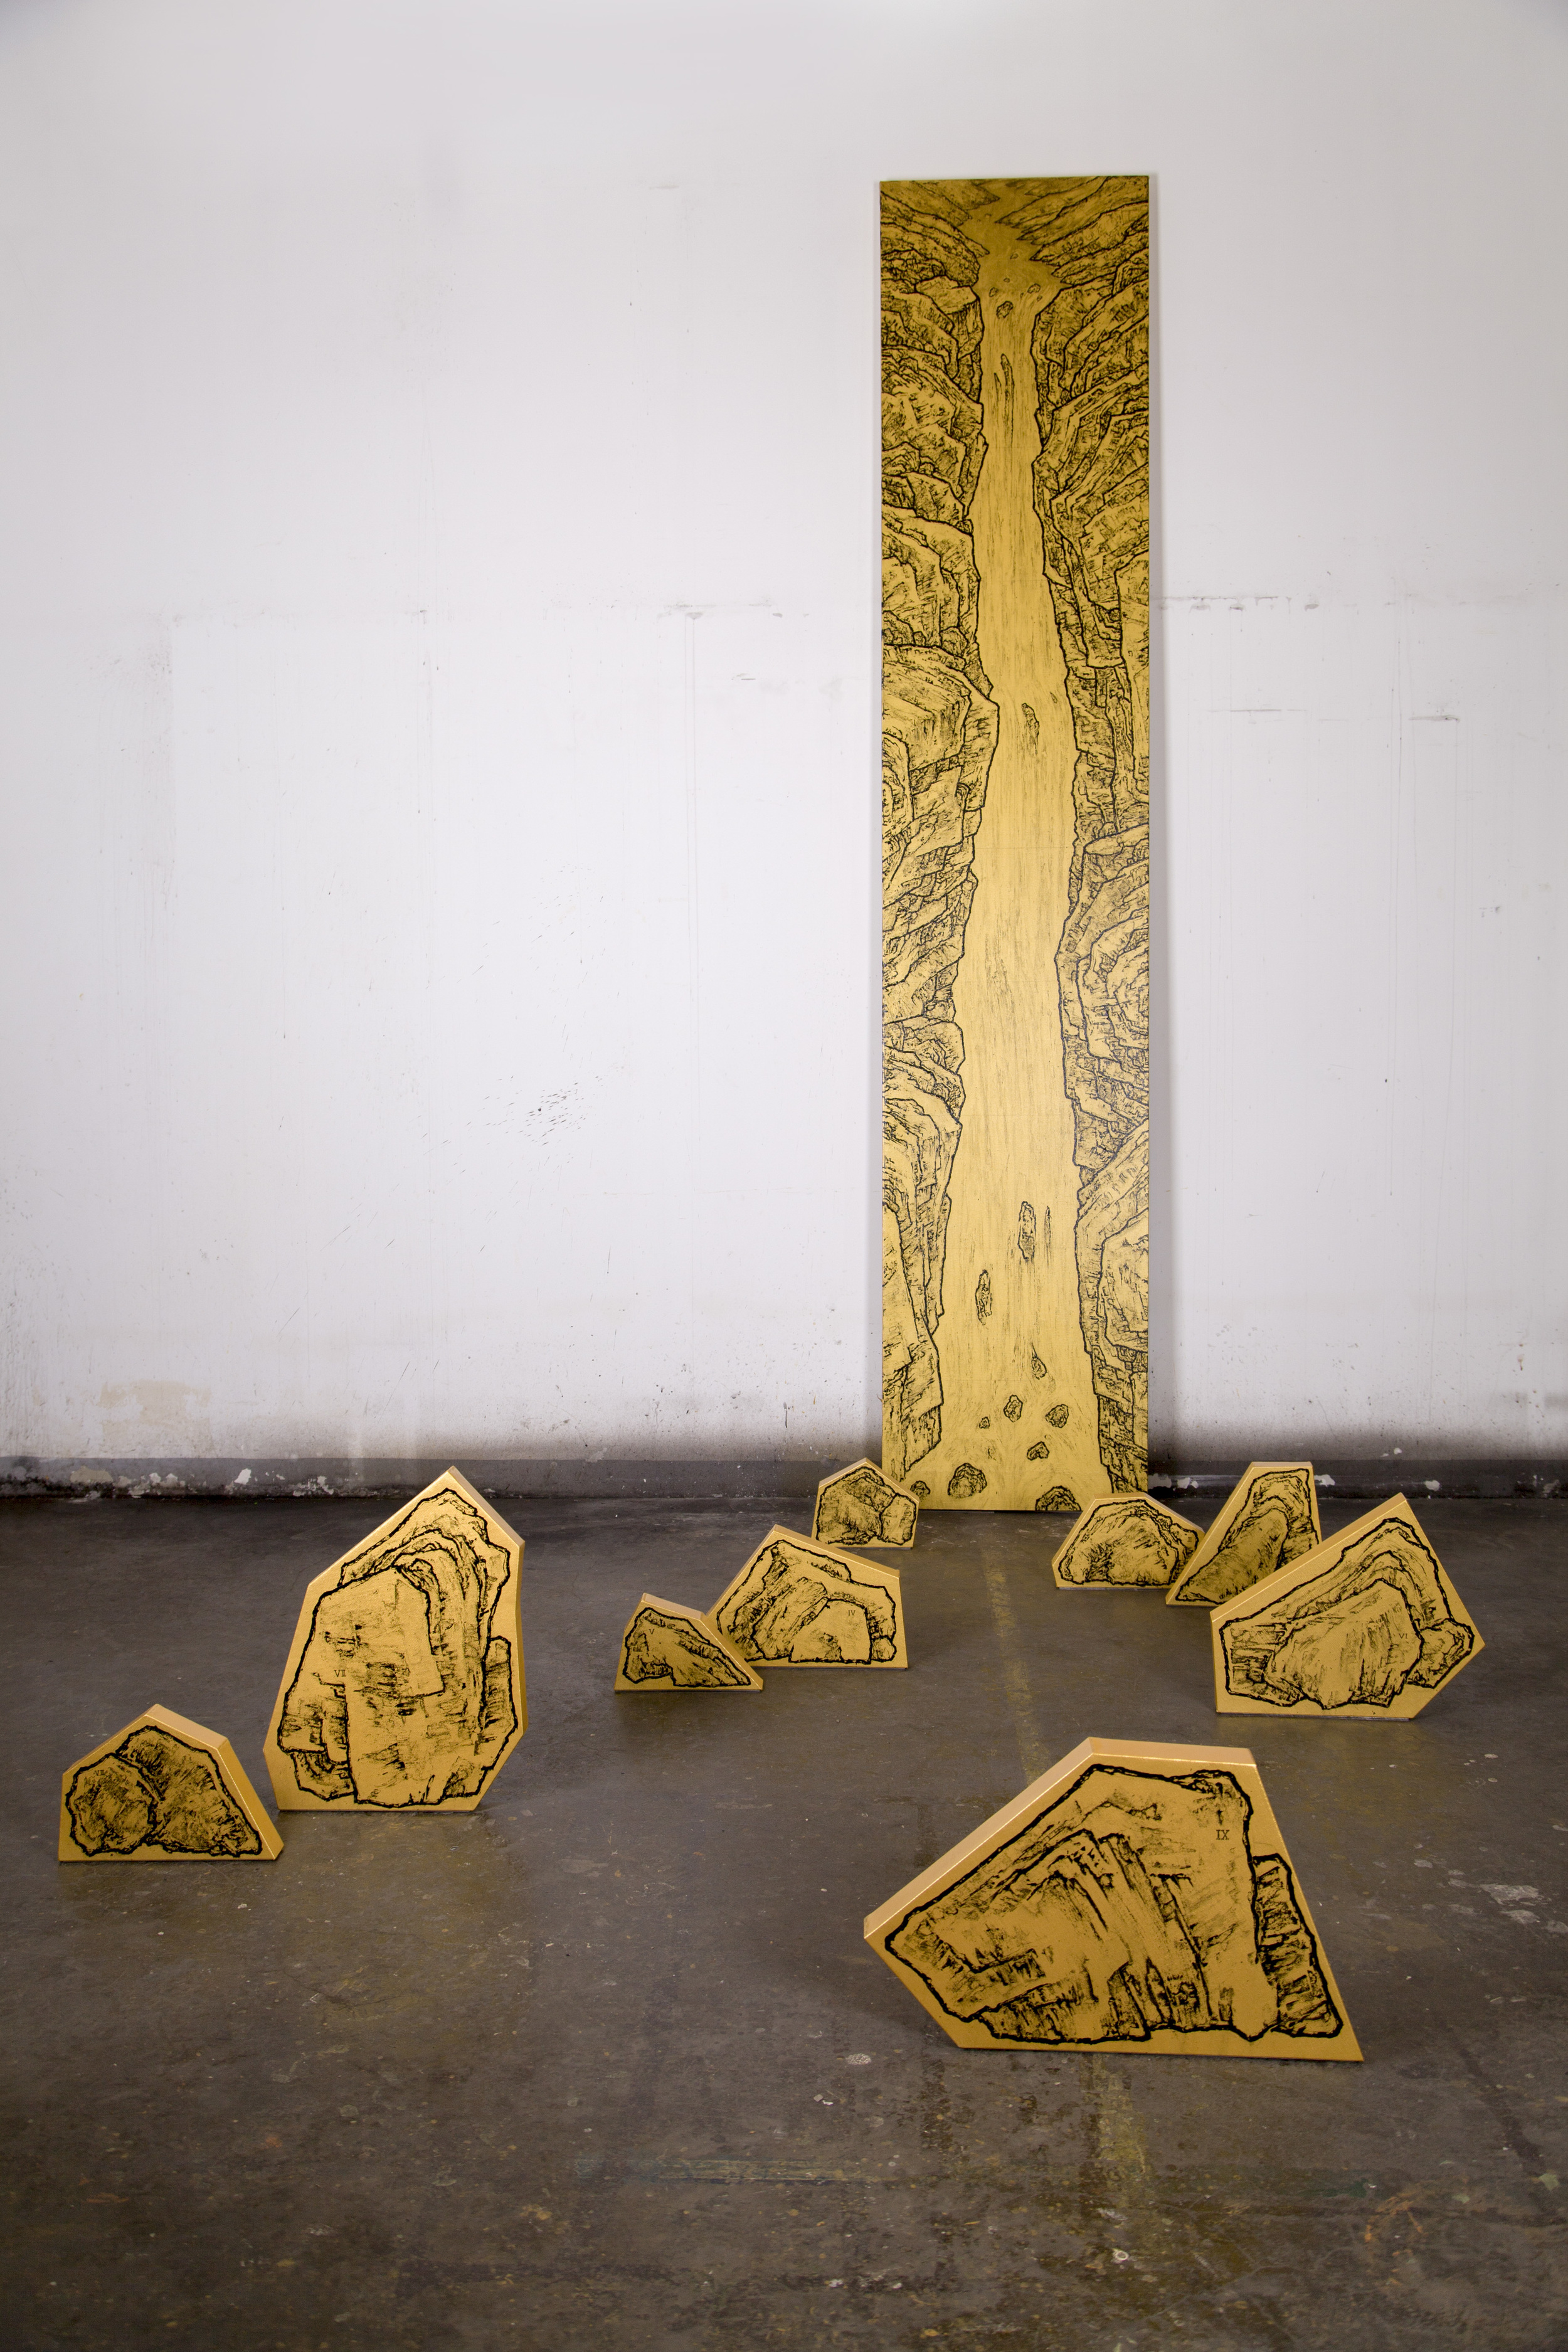 Ni Youyu 倪有鱼, Big Waterfall No.3 大瀑布3, 2012, Acrylic on canvas 布面丙烯,  350 x 500 x 350 cm